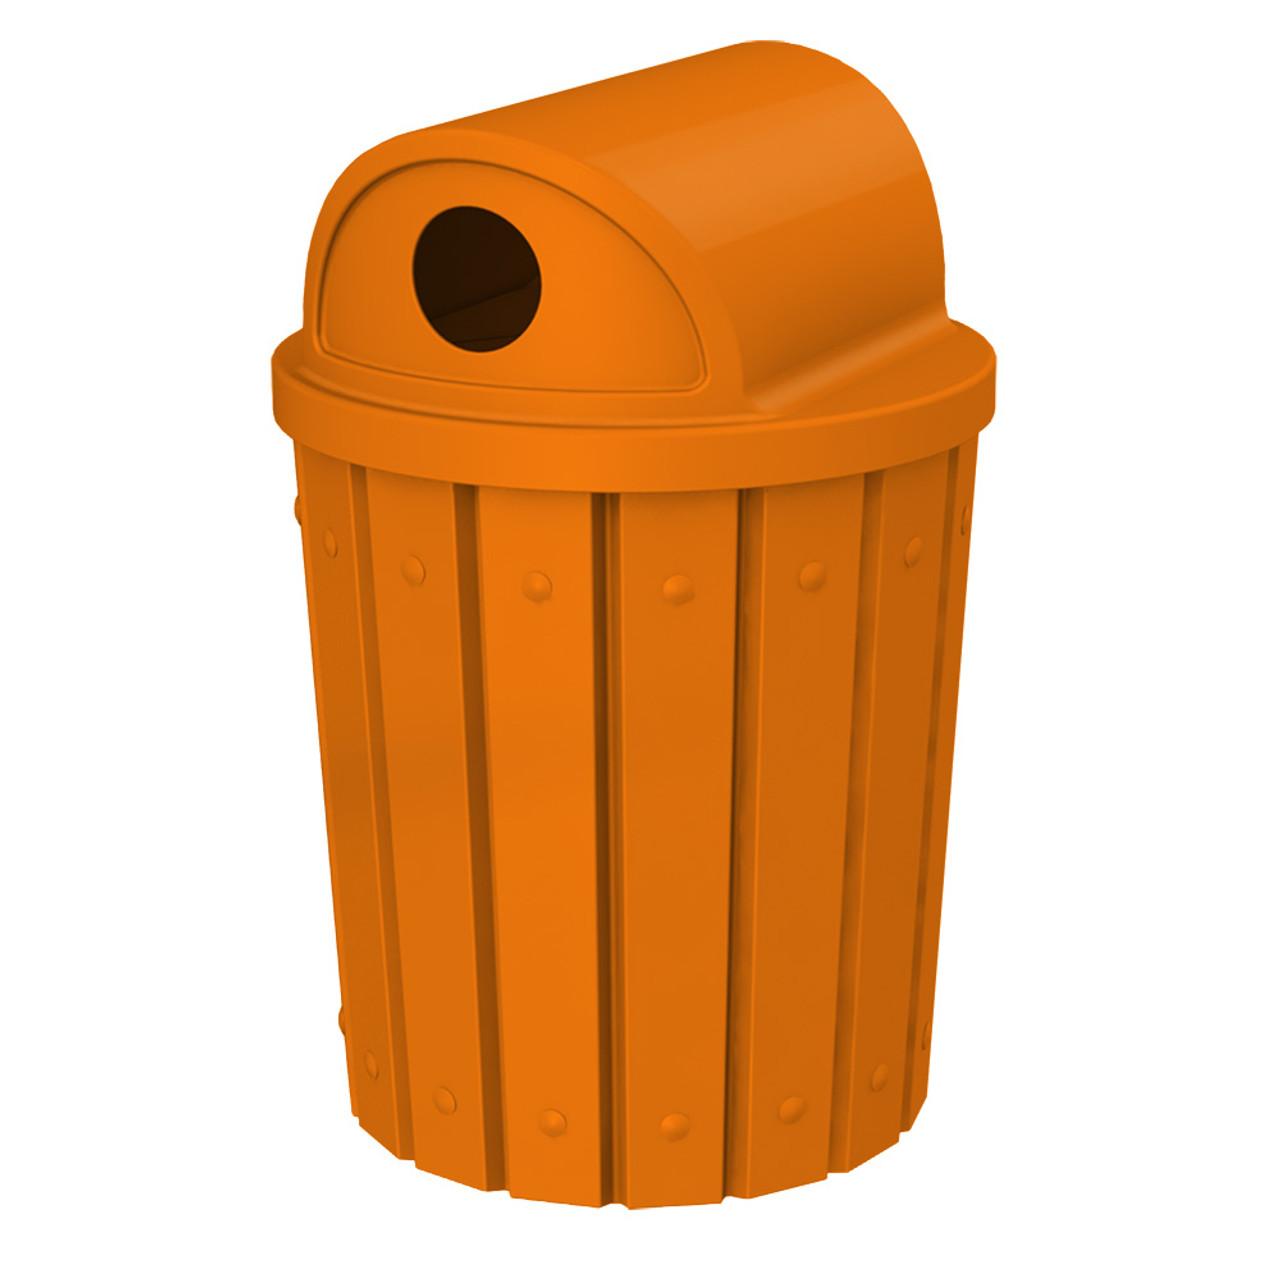 42 Gallon Kolor Can Heavy Duty 2 Way Recycle Lid Park Recycle Bin S8283A-01 ORANGE